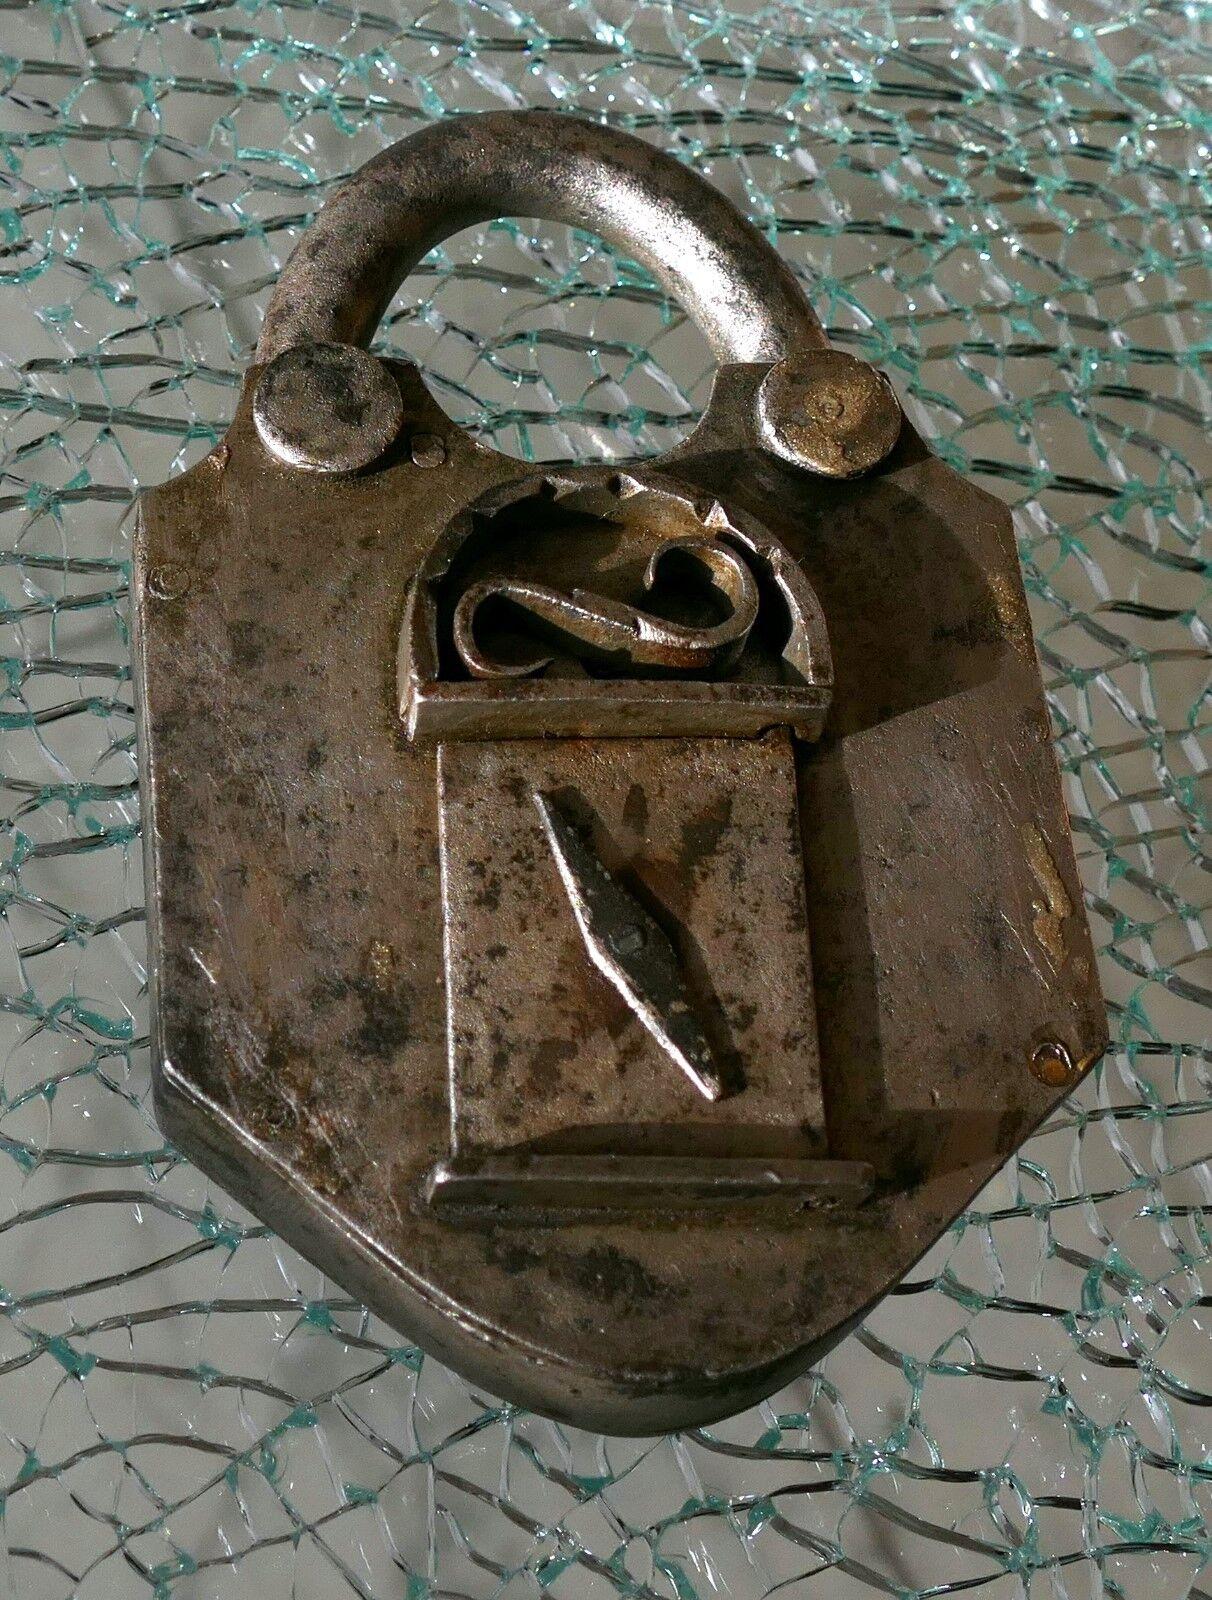 Vorhängeschloss Trickschloss Padlock ca 200 Jahre mit Schlüssel f. Kriegskasse